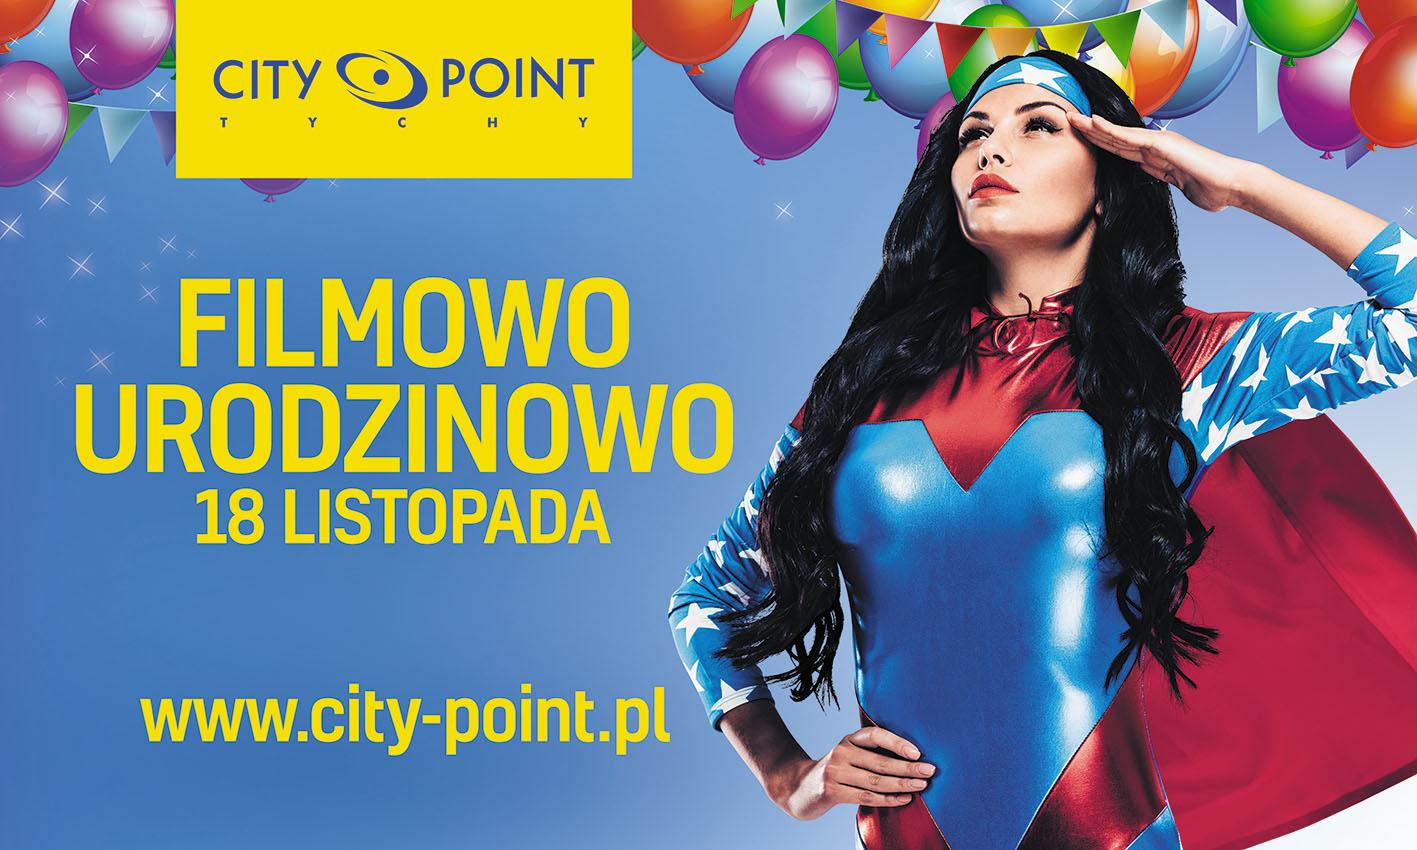 filowo_urodzinowo_city_bliboard